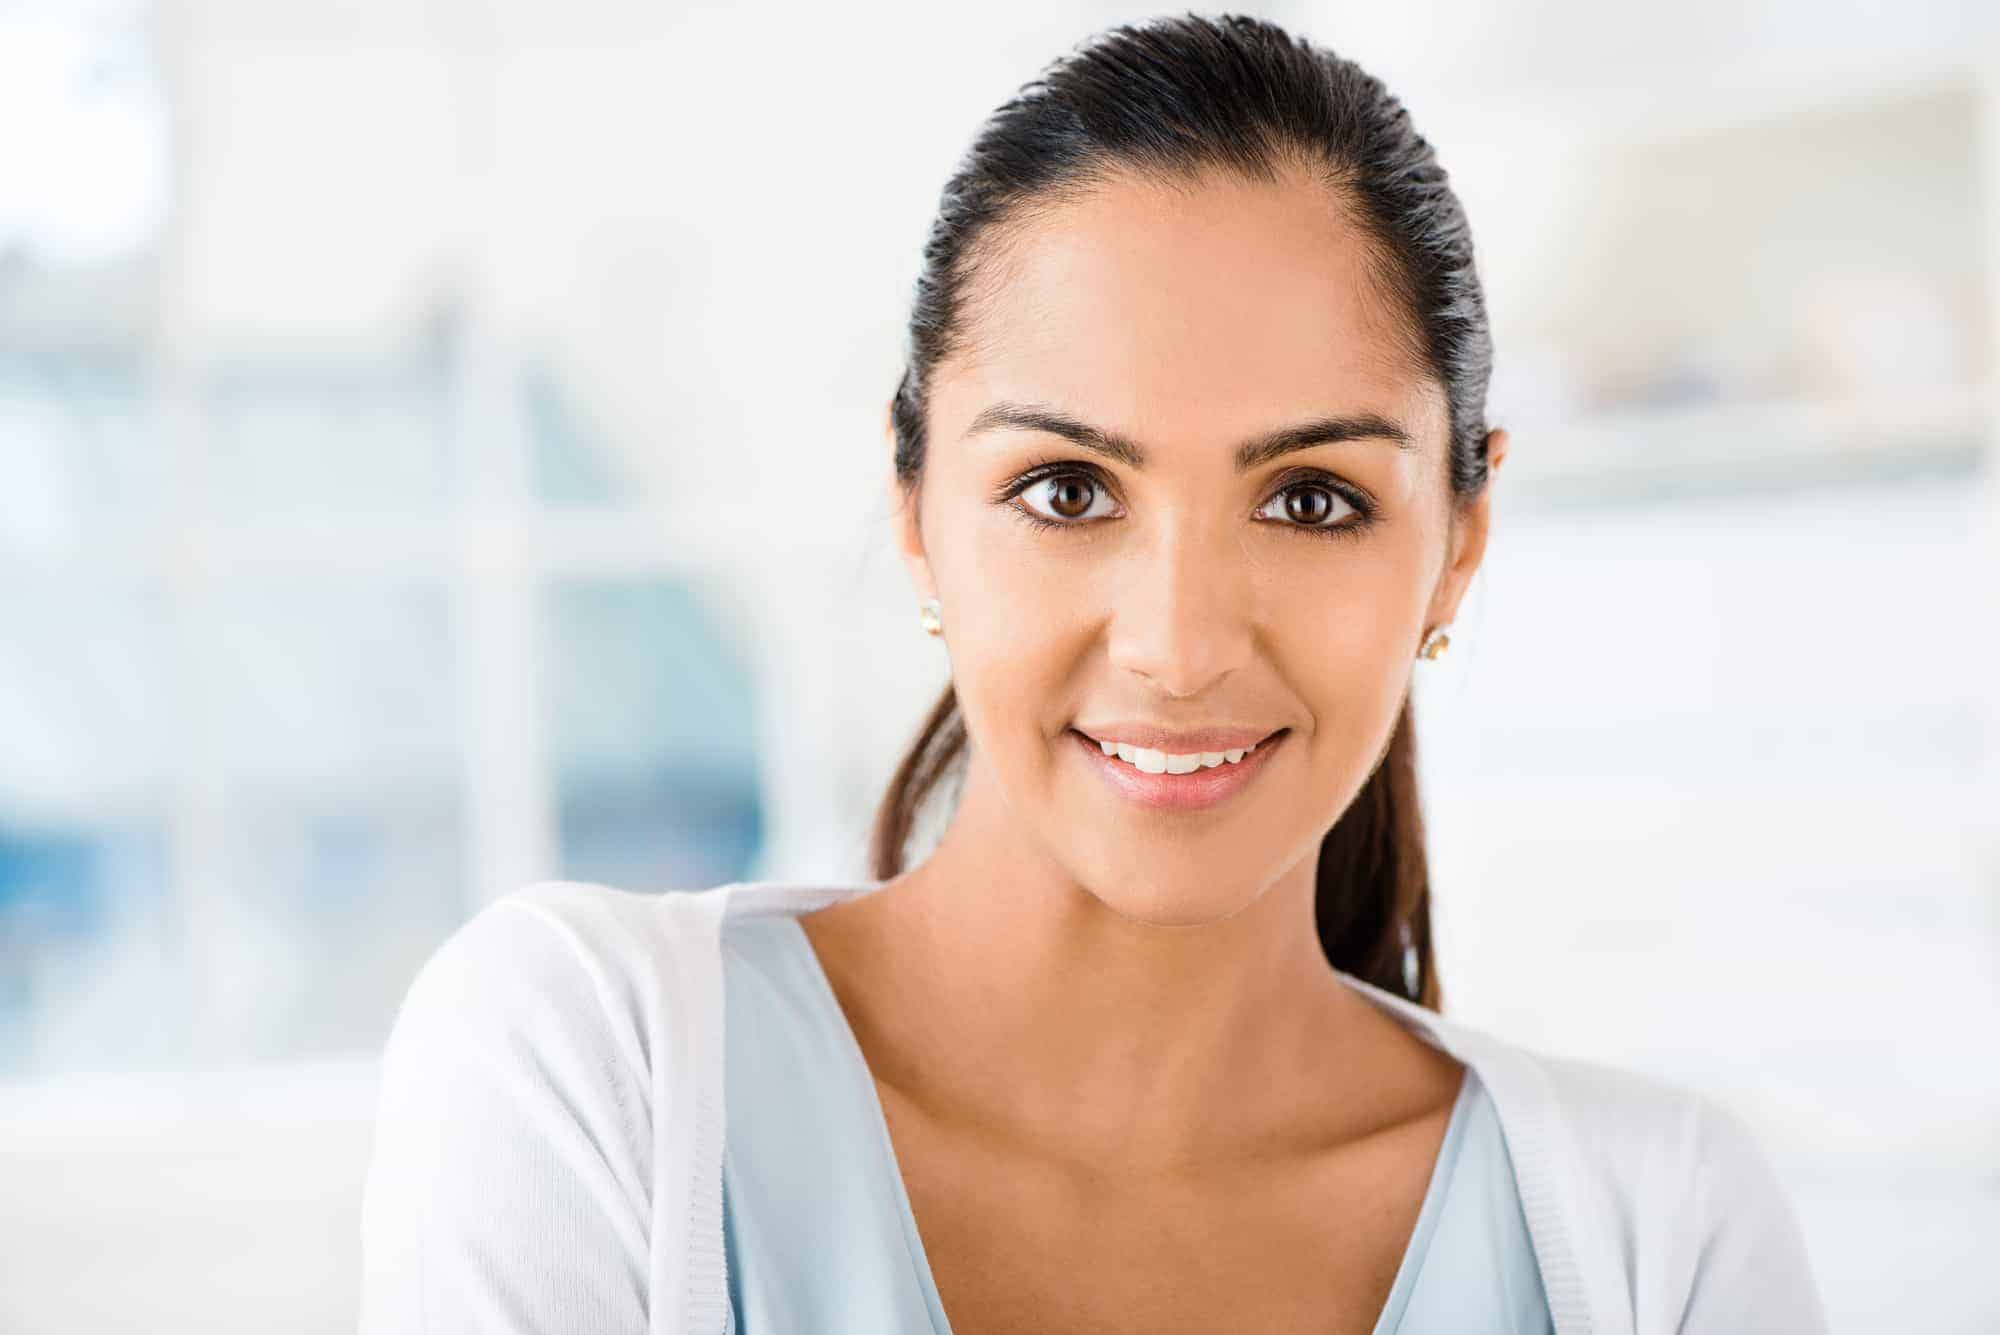 beautiful Indian woman smiling